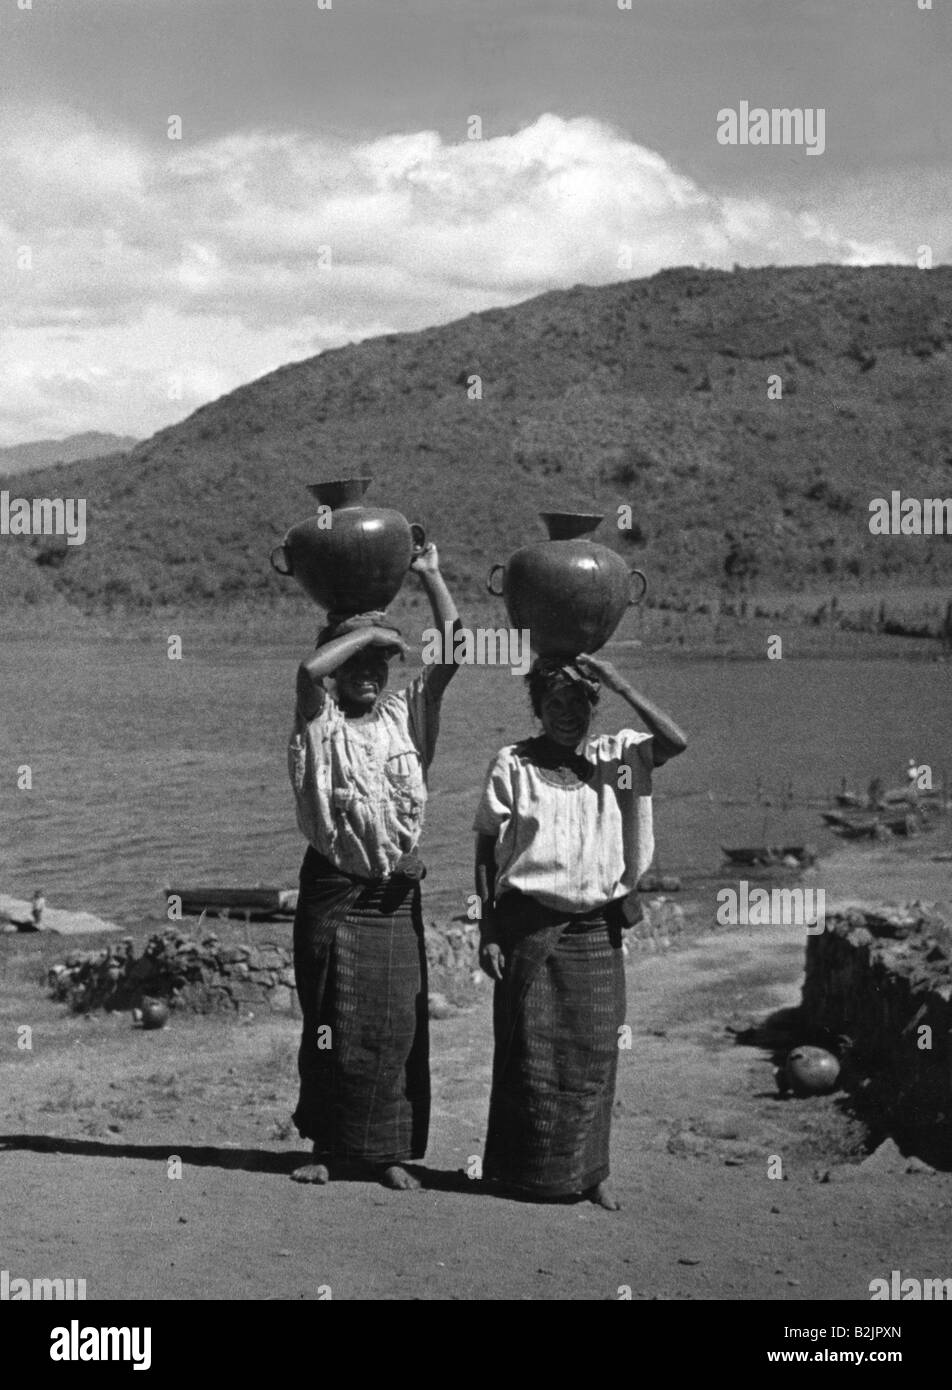 geography / travel, Guatemala, people, women, Tinajas, women carrying water jugs from Lake Atitlan, 1960s, Additional - Stock Image